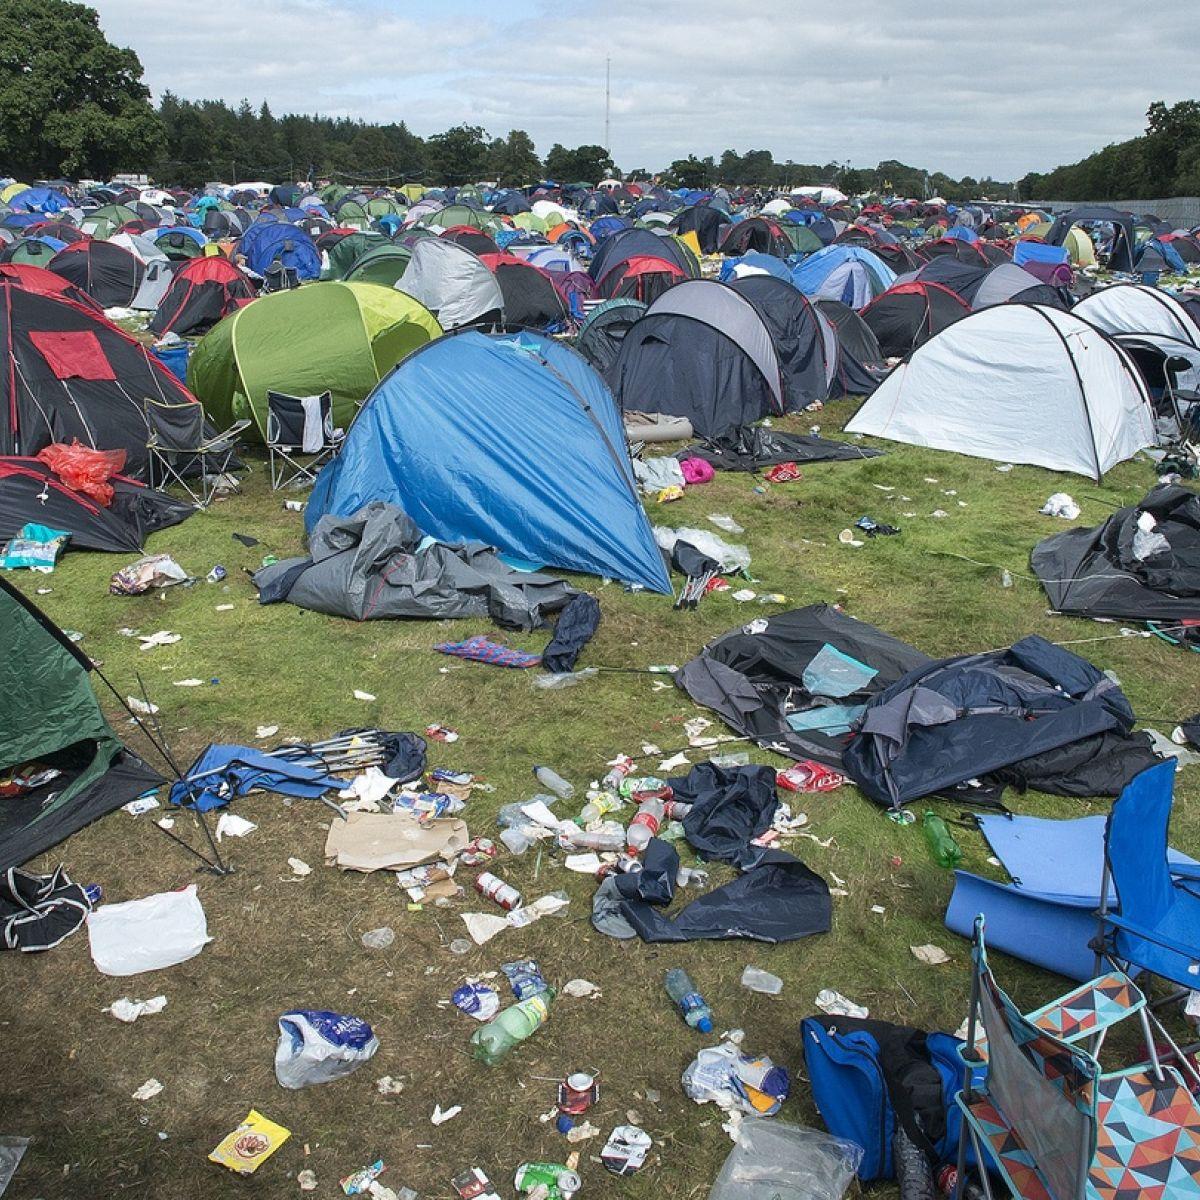 The first 'Irish Times' sustainability survey: festivals